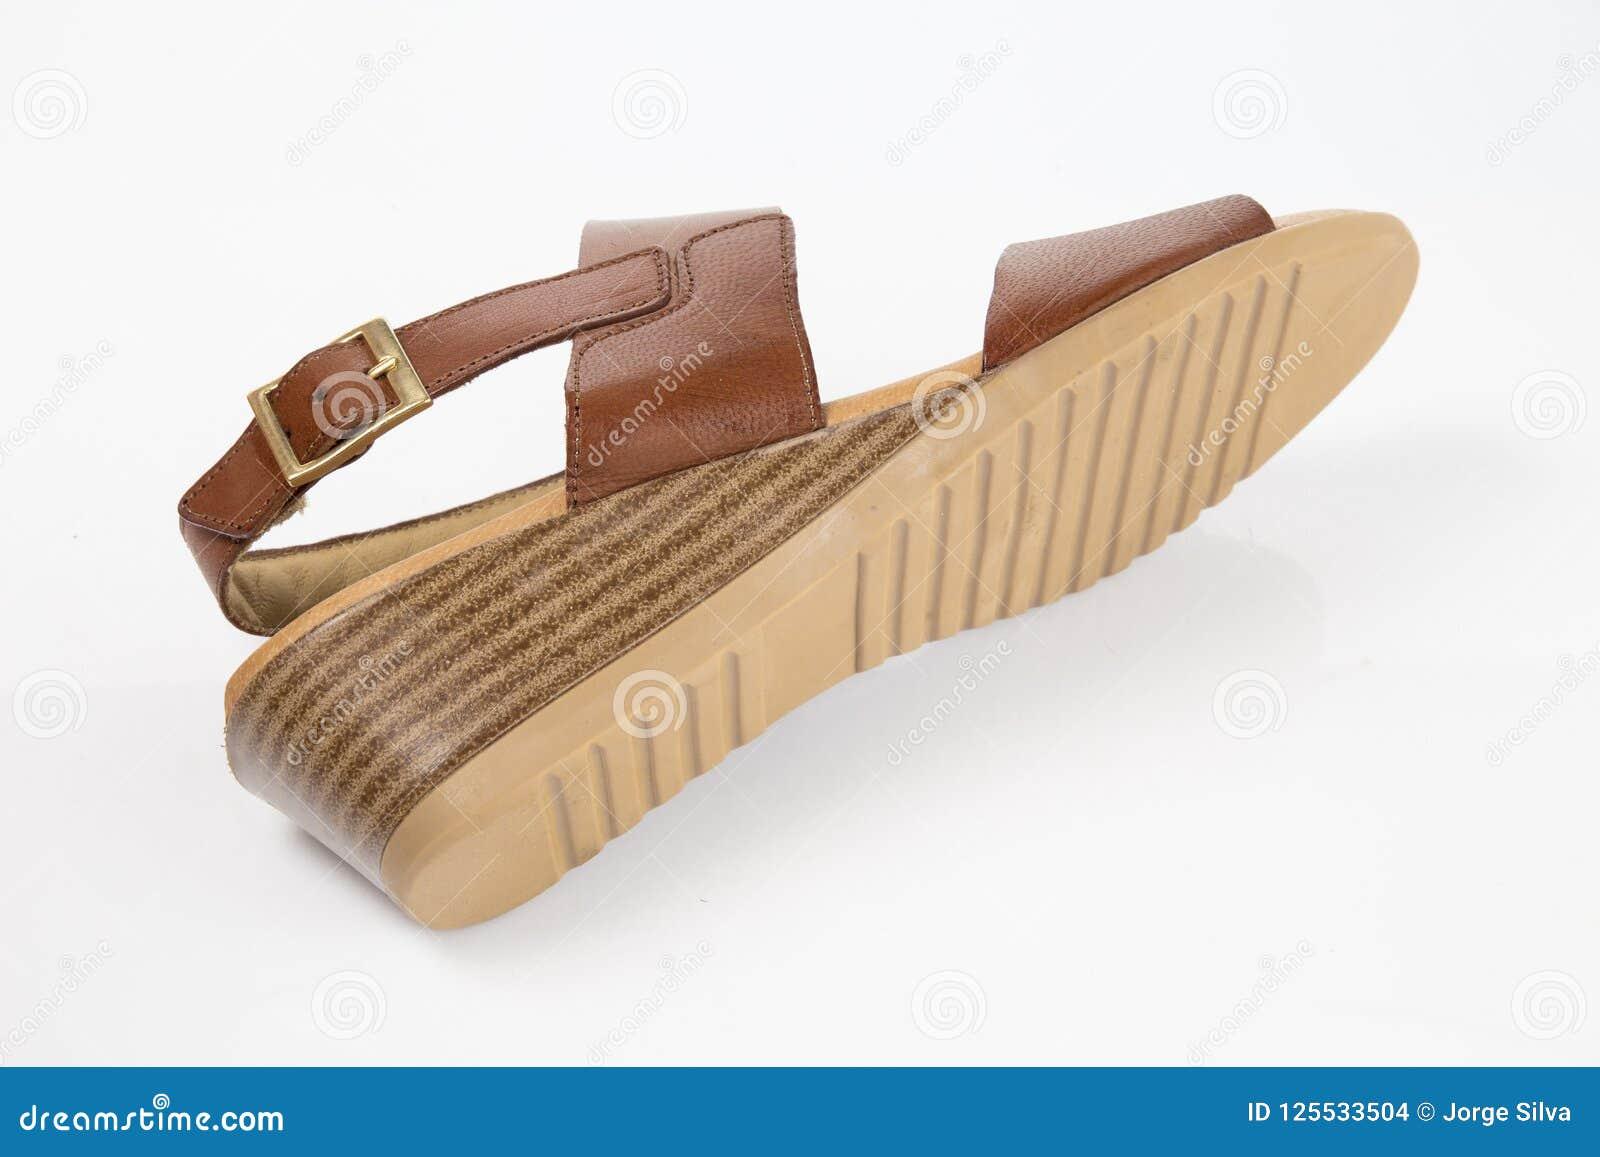 Sandalia elegante de cuero marr?n femenina